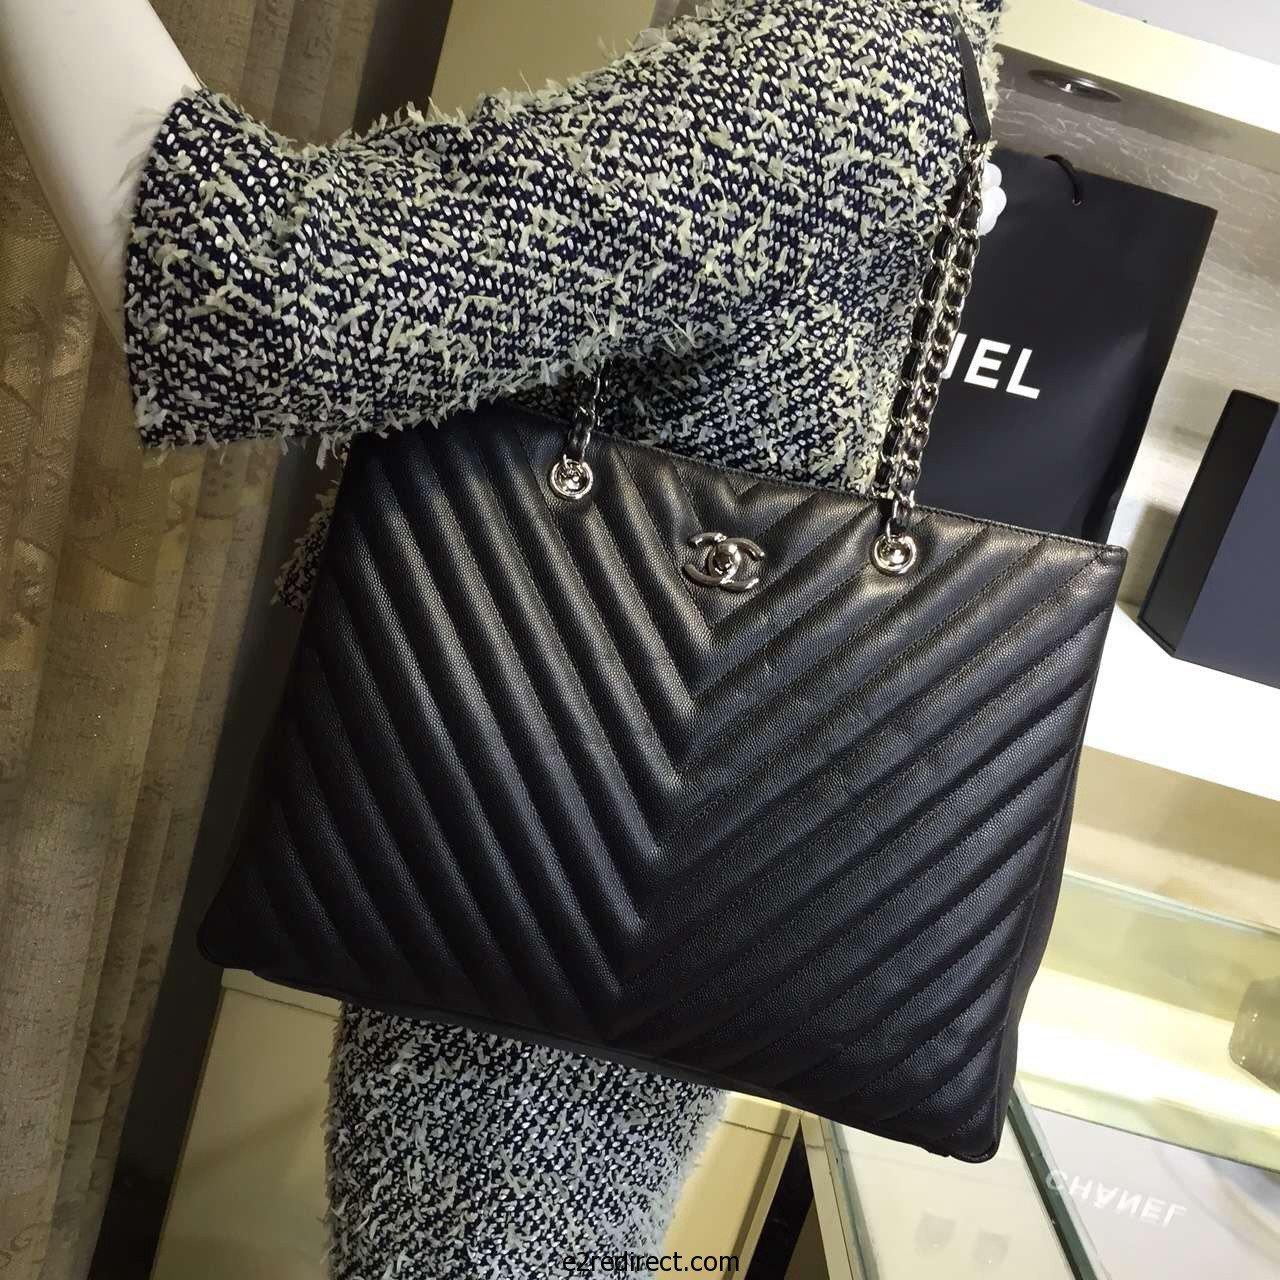 3130be60ed3104 Chanel Large Classic Tote Bag | Bragmybag